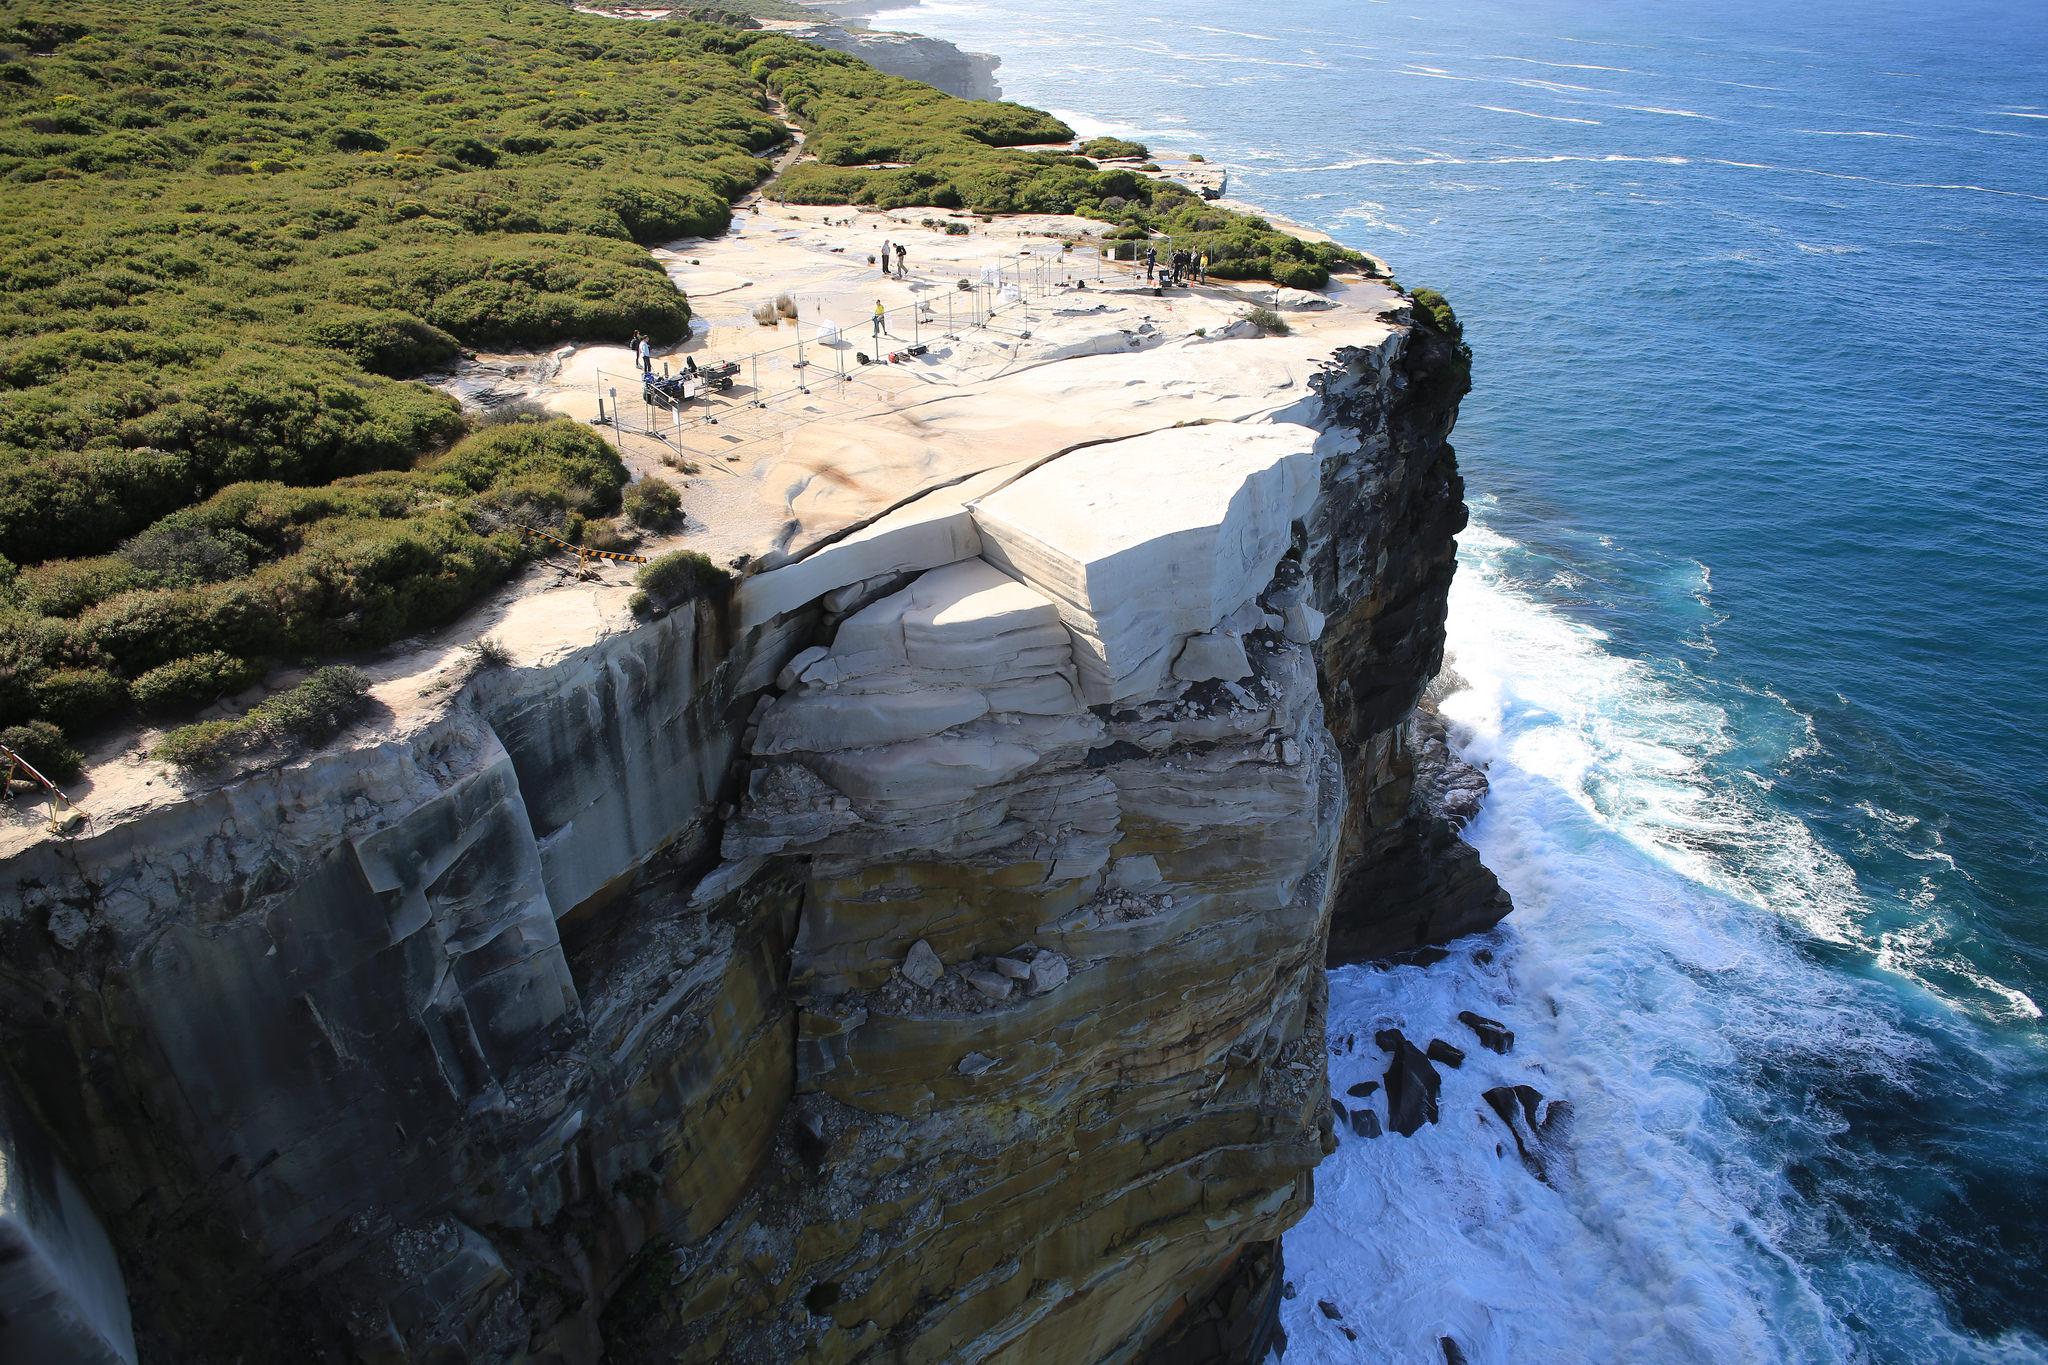 Australia S Wedding Cake Rock May Collapse Into The Sea Cnn Travel